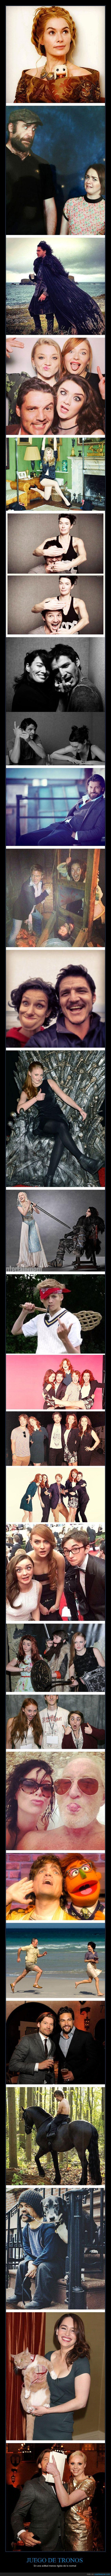 actores,casting,got,juego de tronos,series